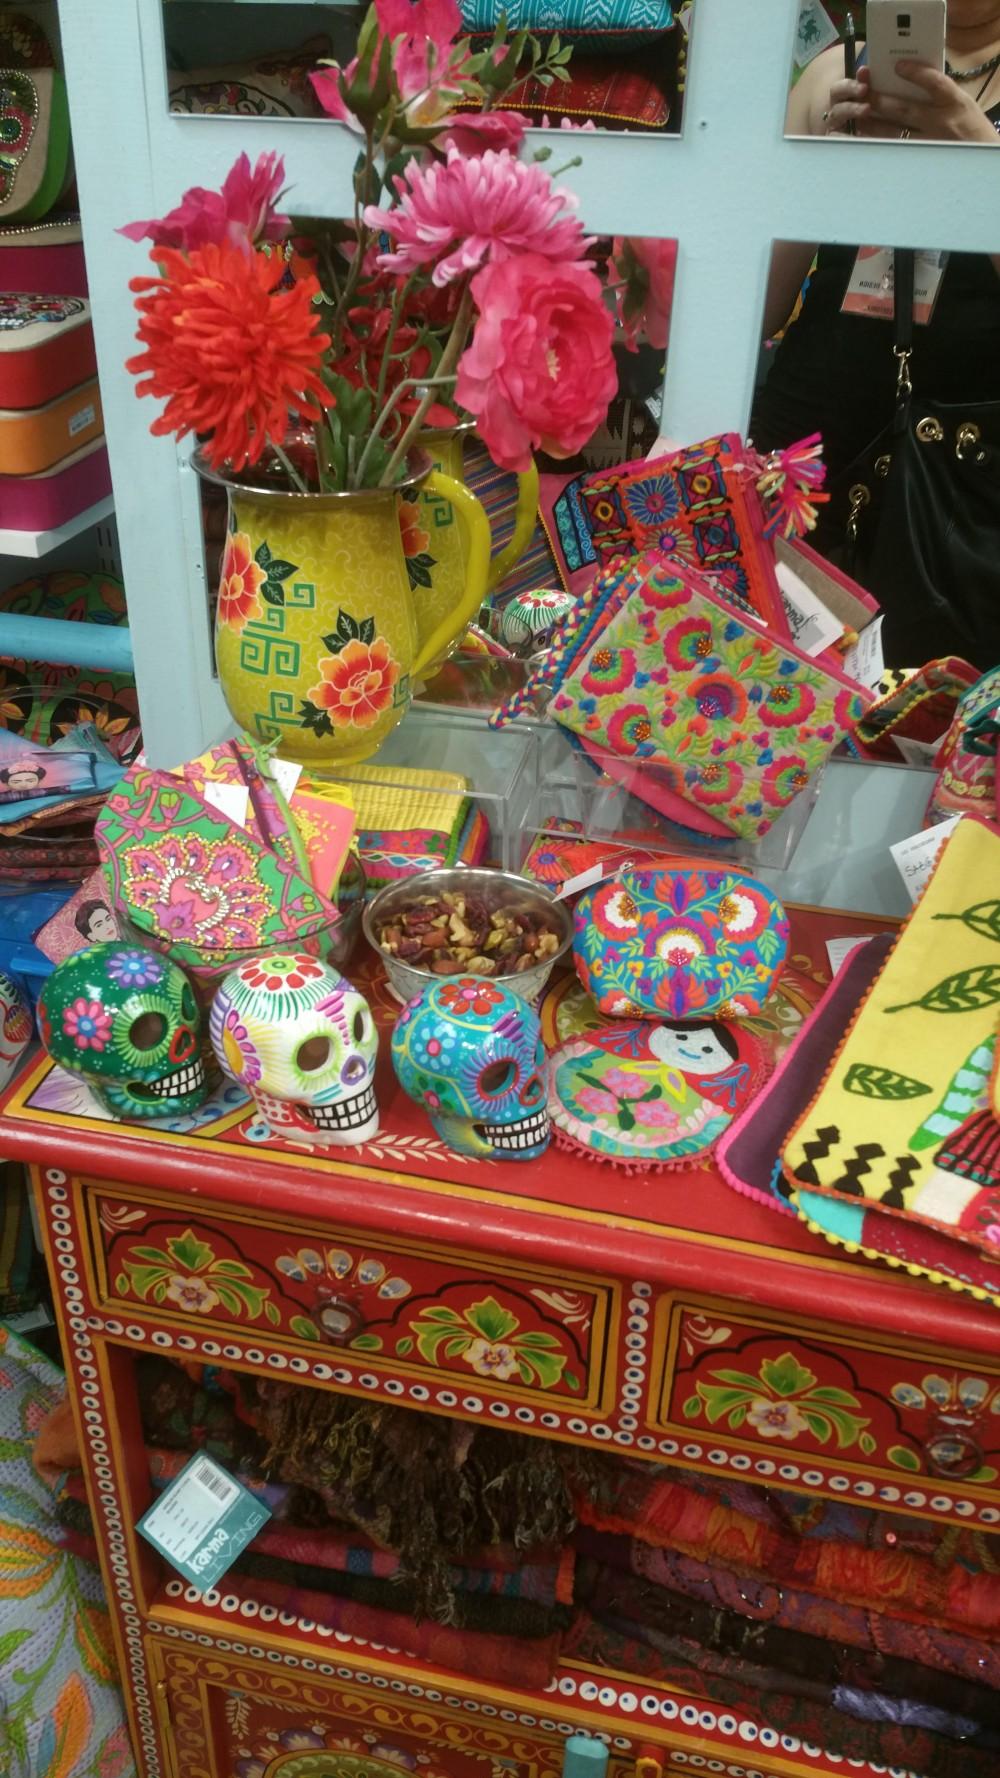 New Colorful Karma Living Design pillows ottomans